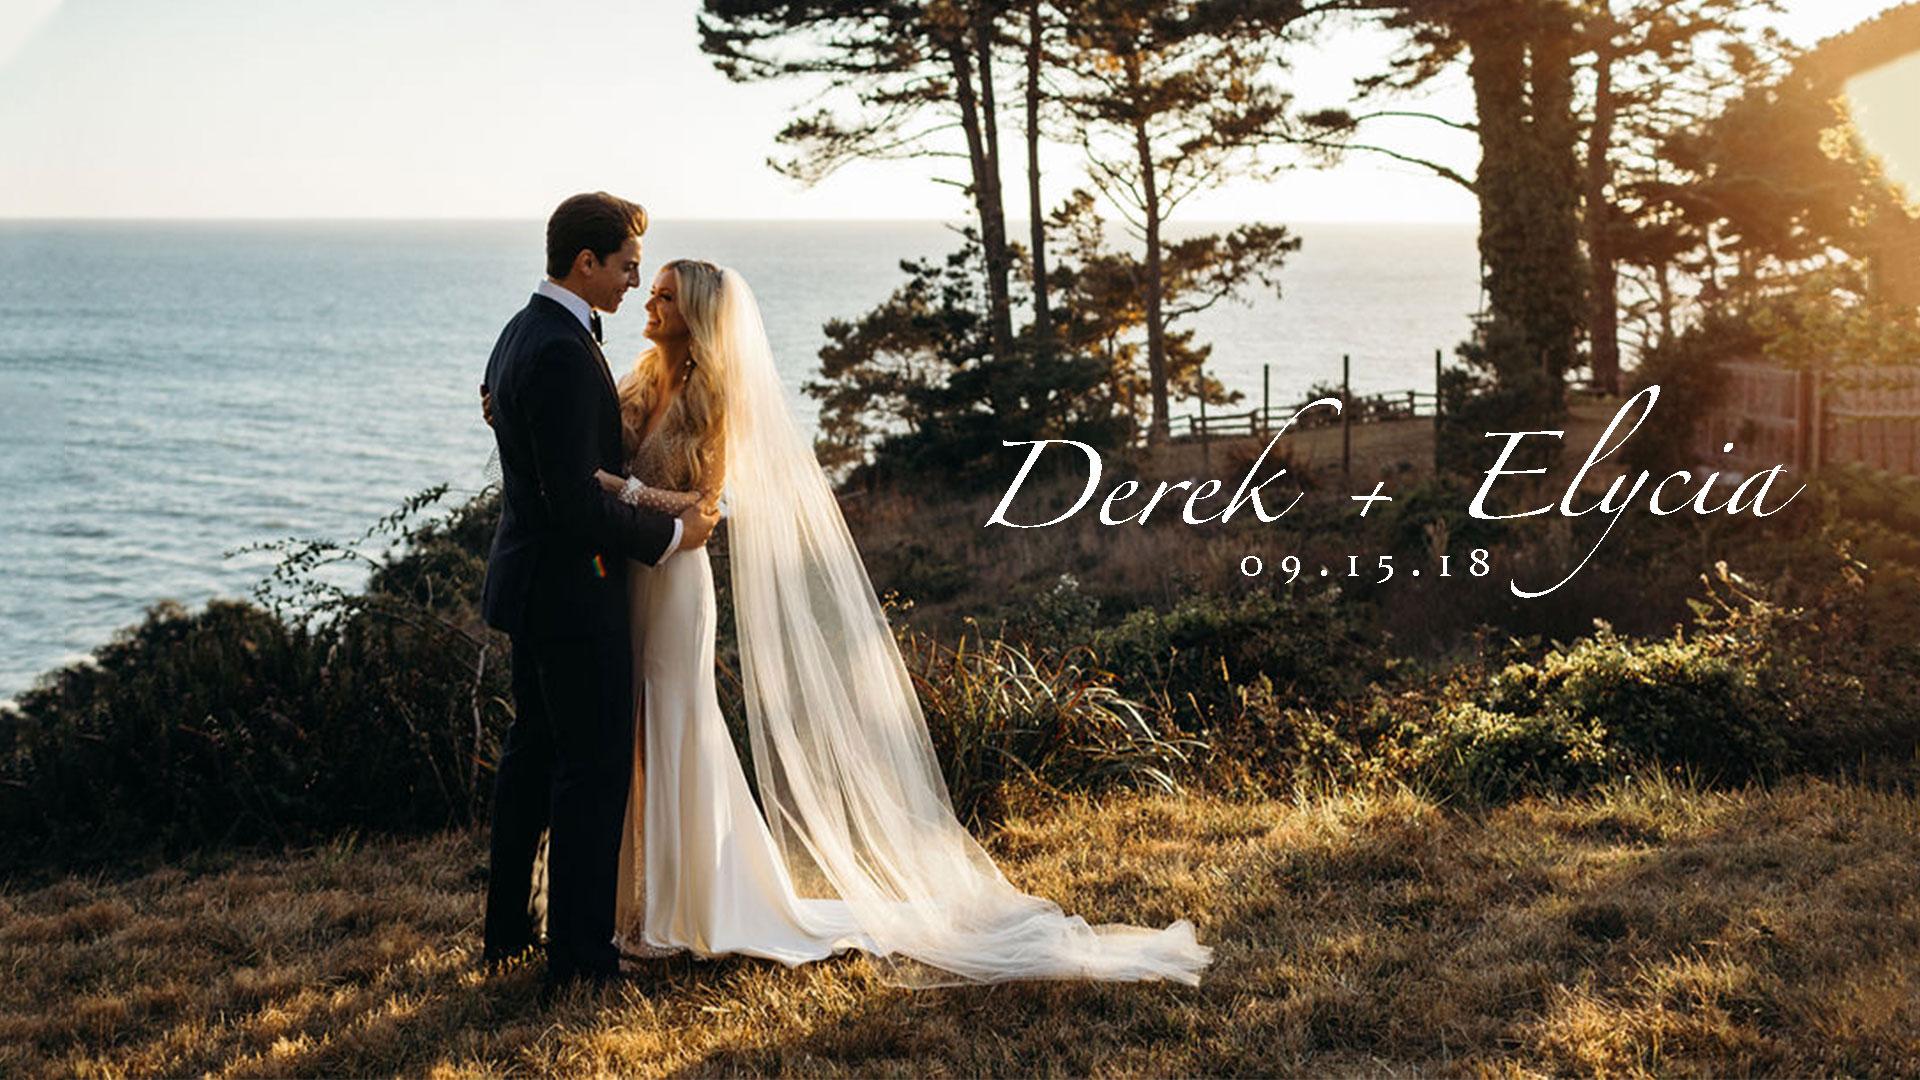 Derek + Elycia | Gualala, California | Ocean Cliff